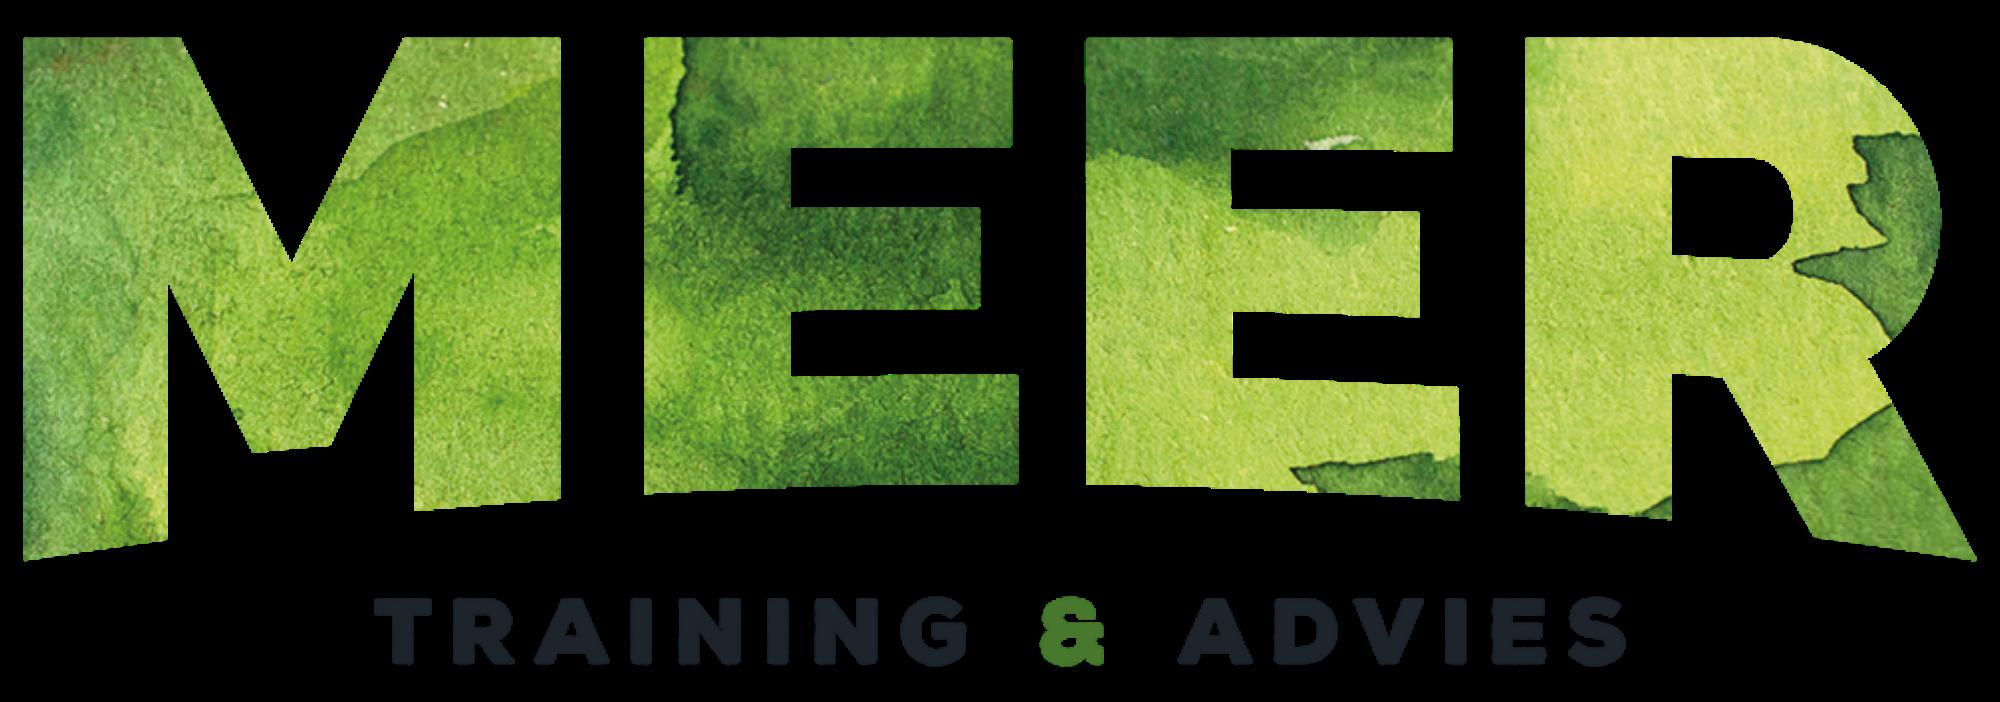 MEER Training & Advies